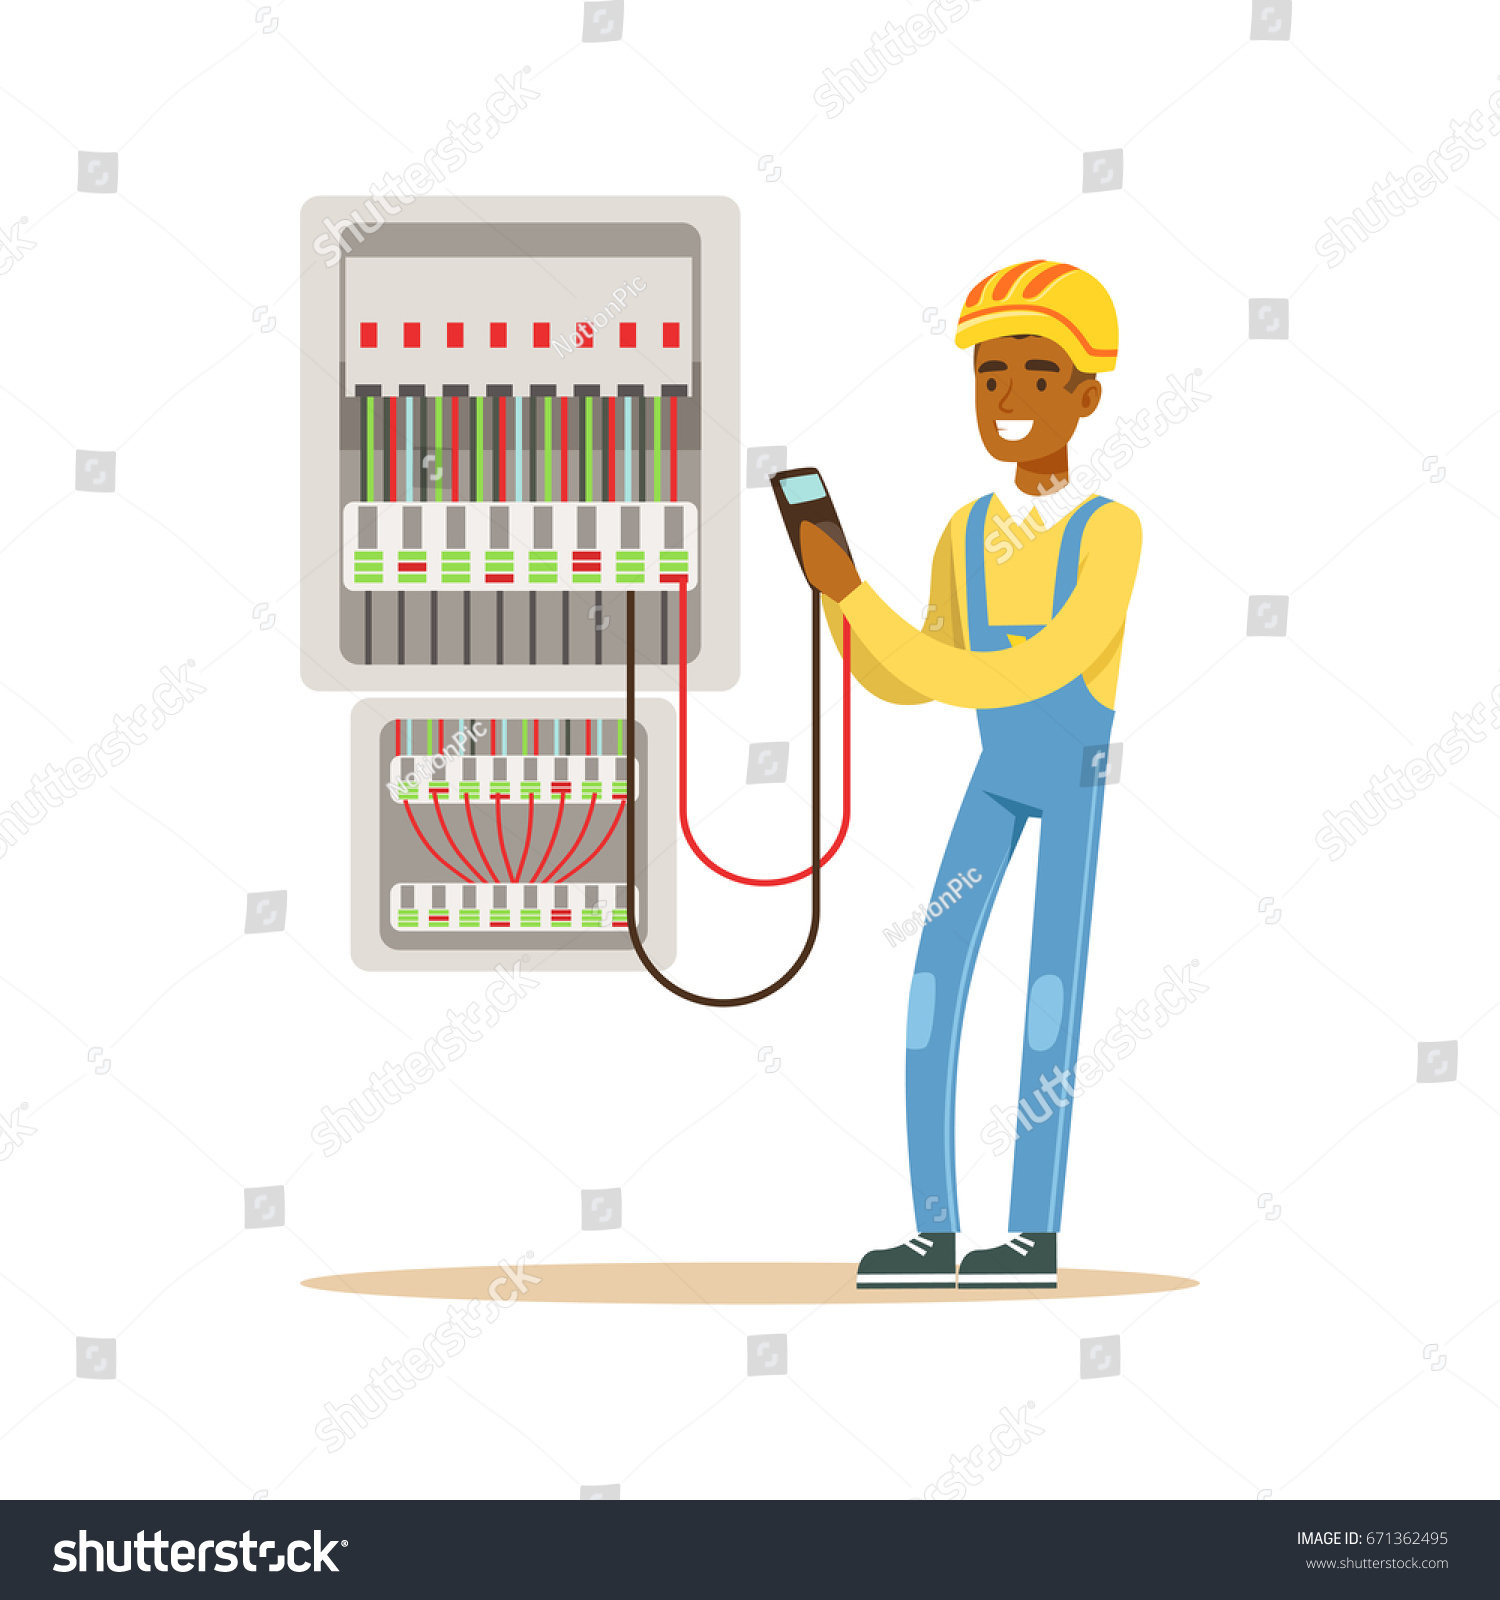 hight resolution of fuse box cartoon share circuit diagrams